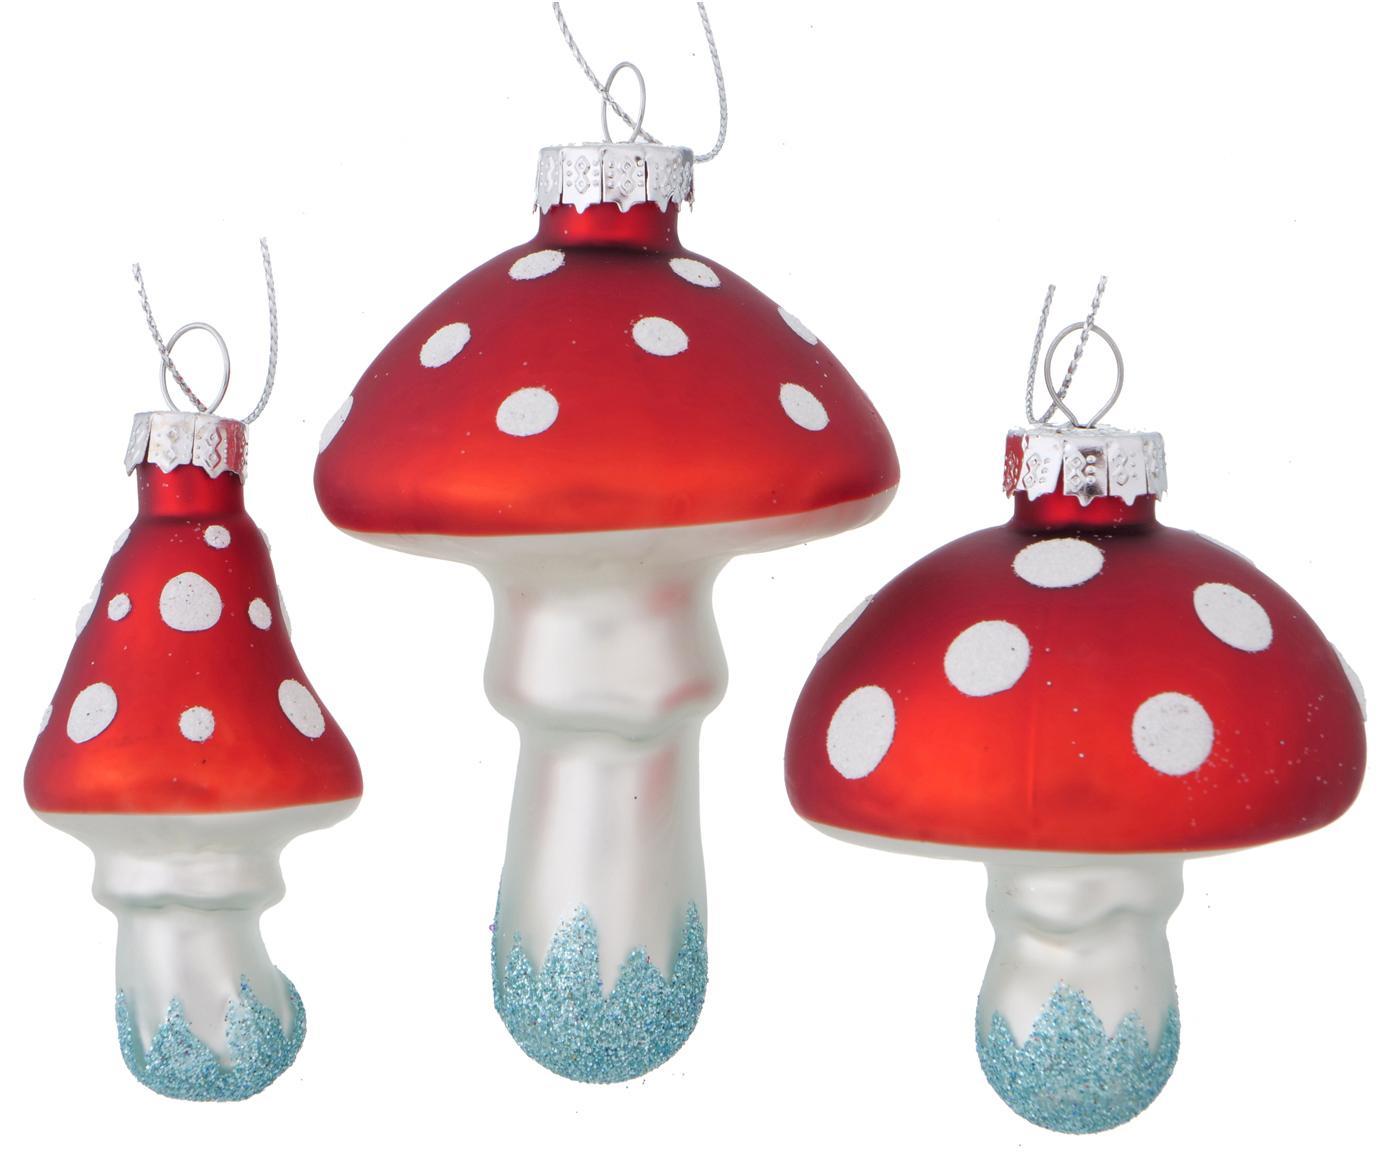 Set de adornos navideños Minamo, 3pzas., Azul claro, blanco, rojo, Set de diferentes tamaños